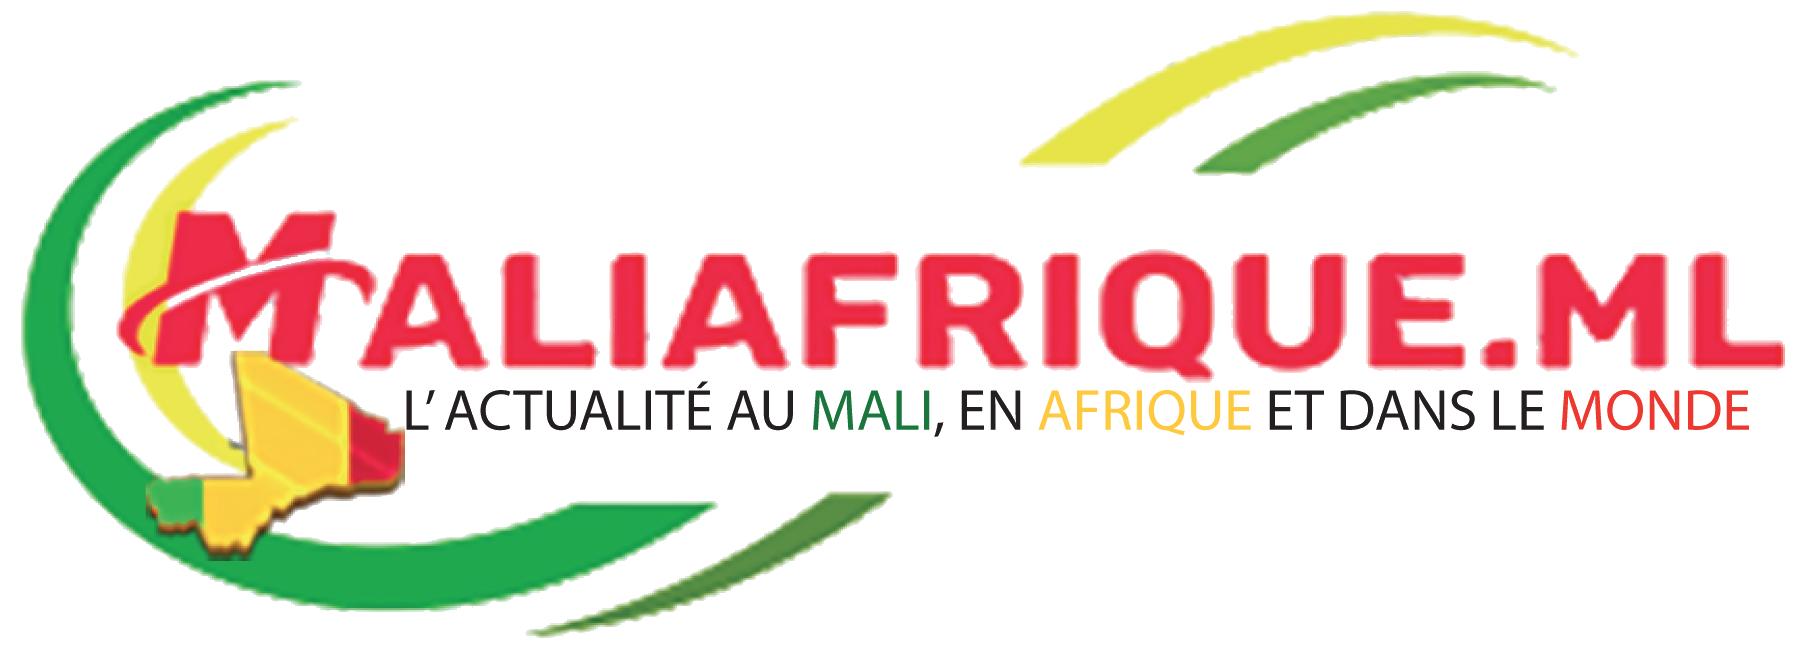 maliafrique.ml